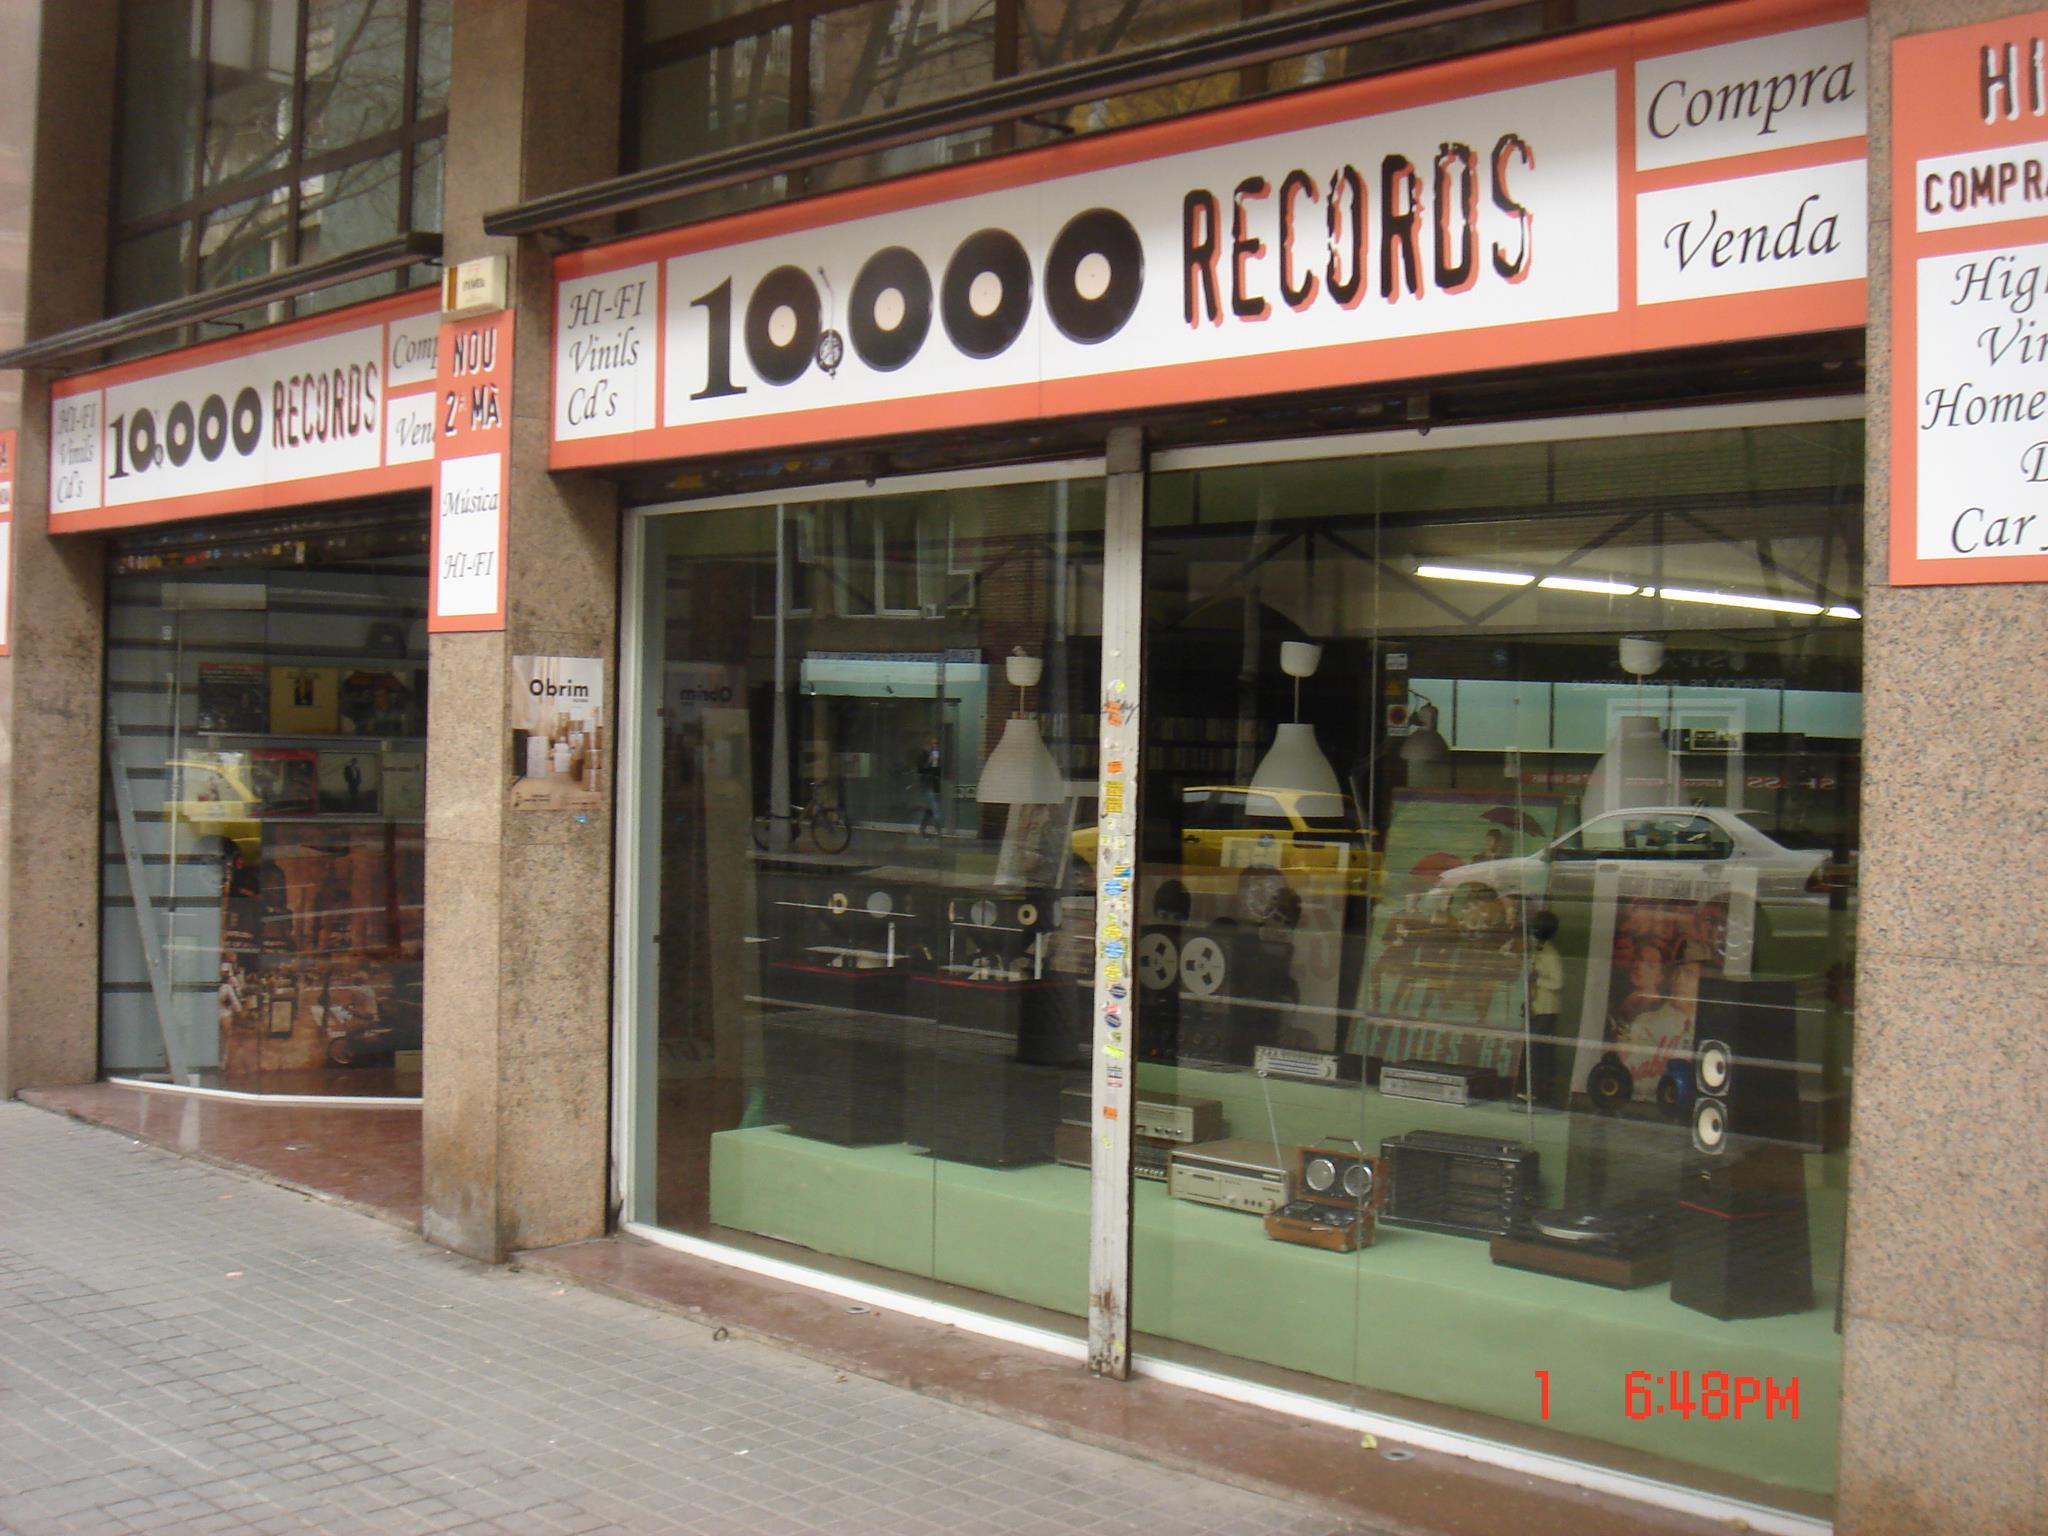 10,000 Records